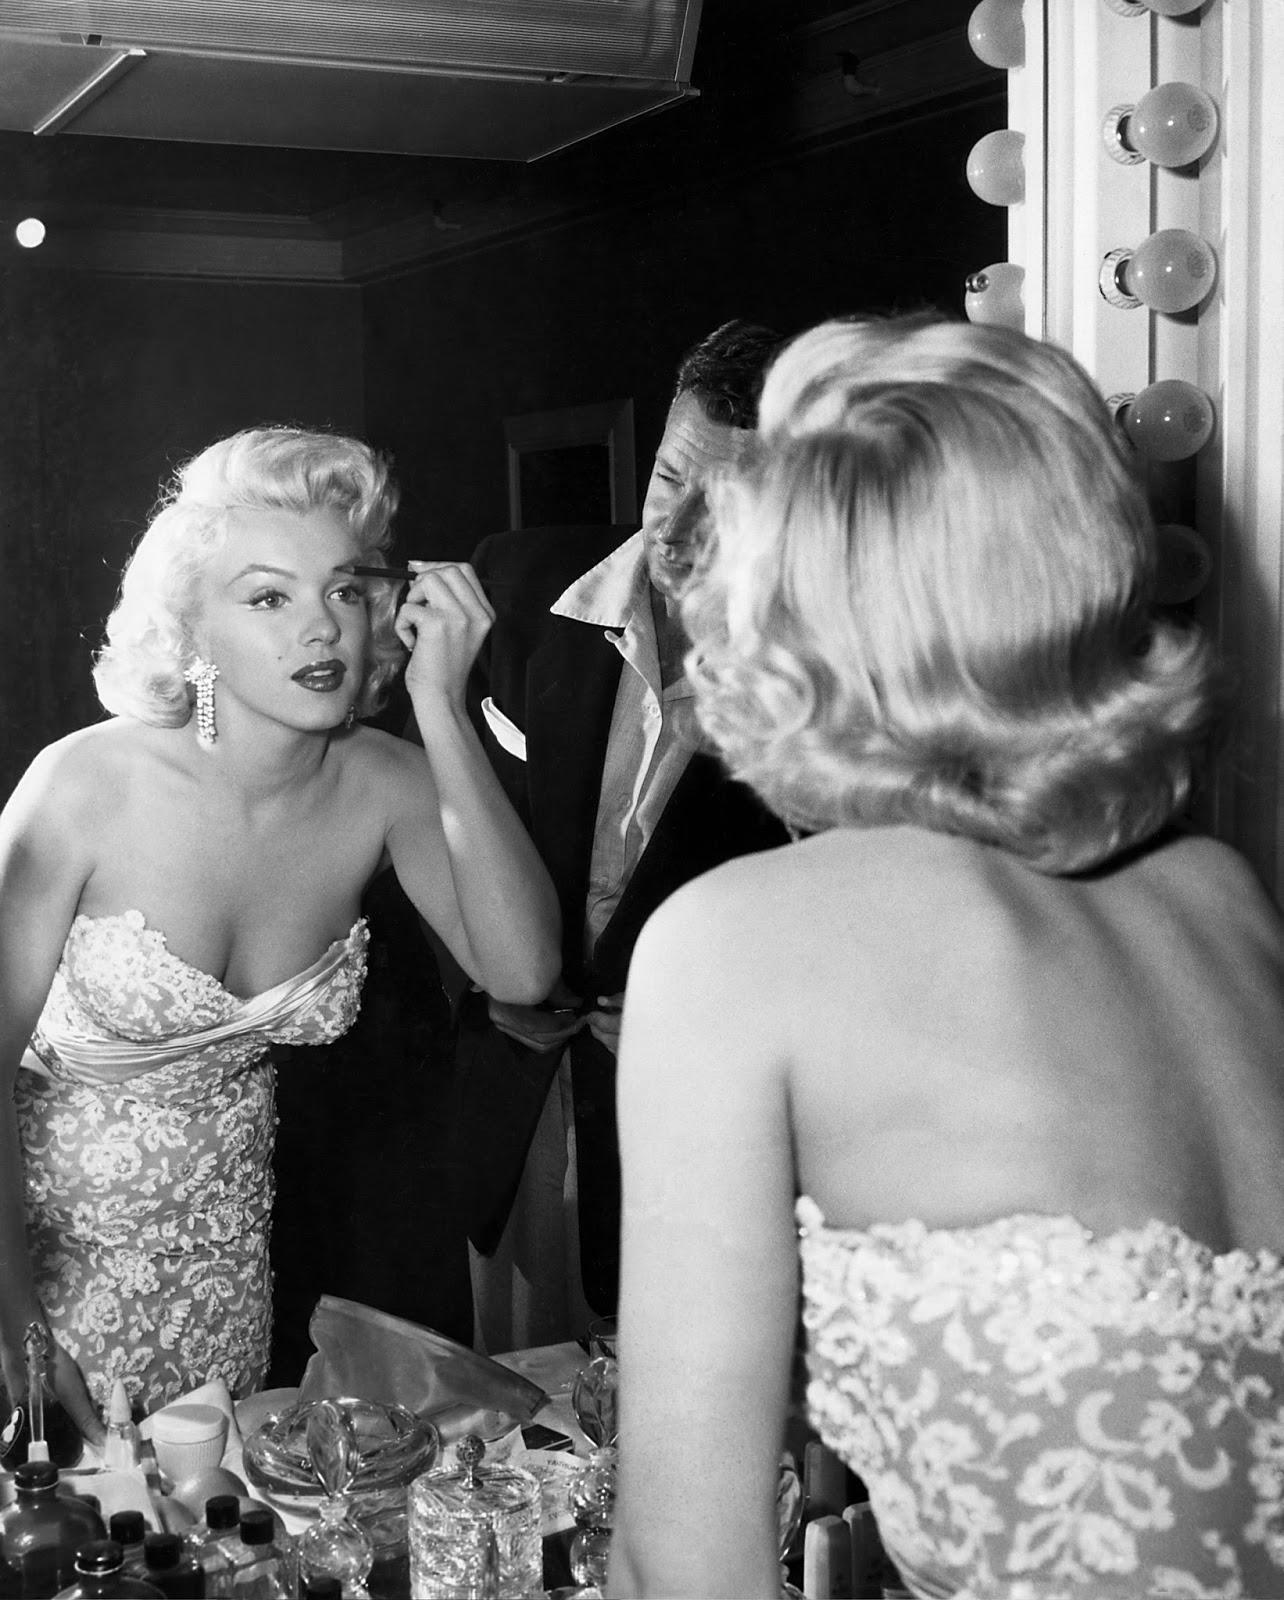 Classy And Glamorous Photo: KierslynK Photography: Glamour & Vogue